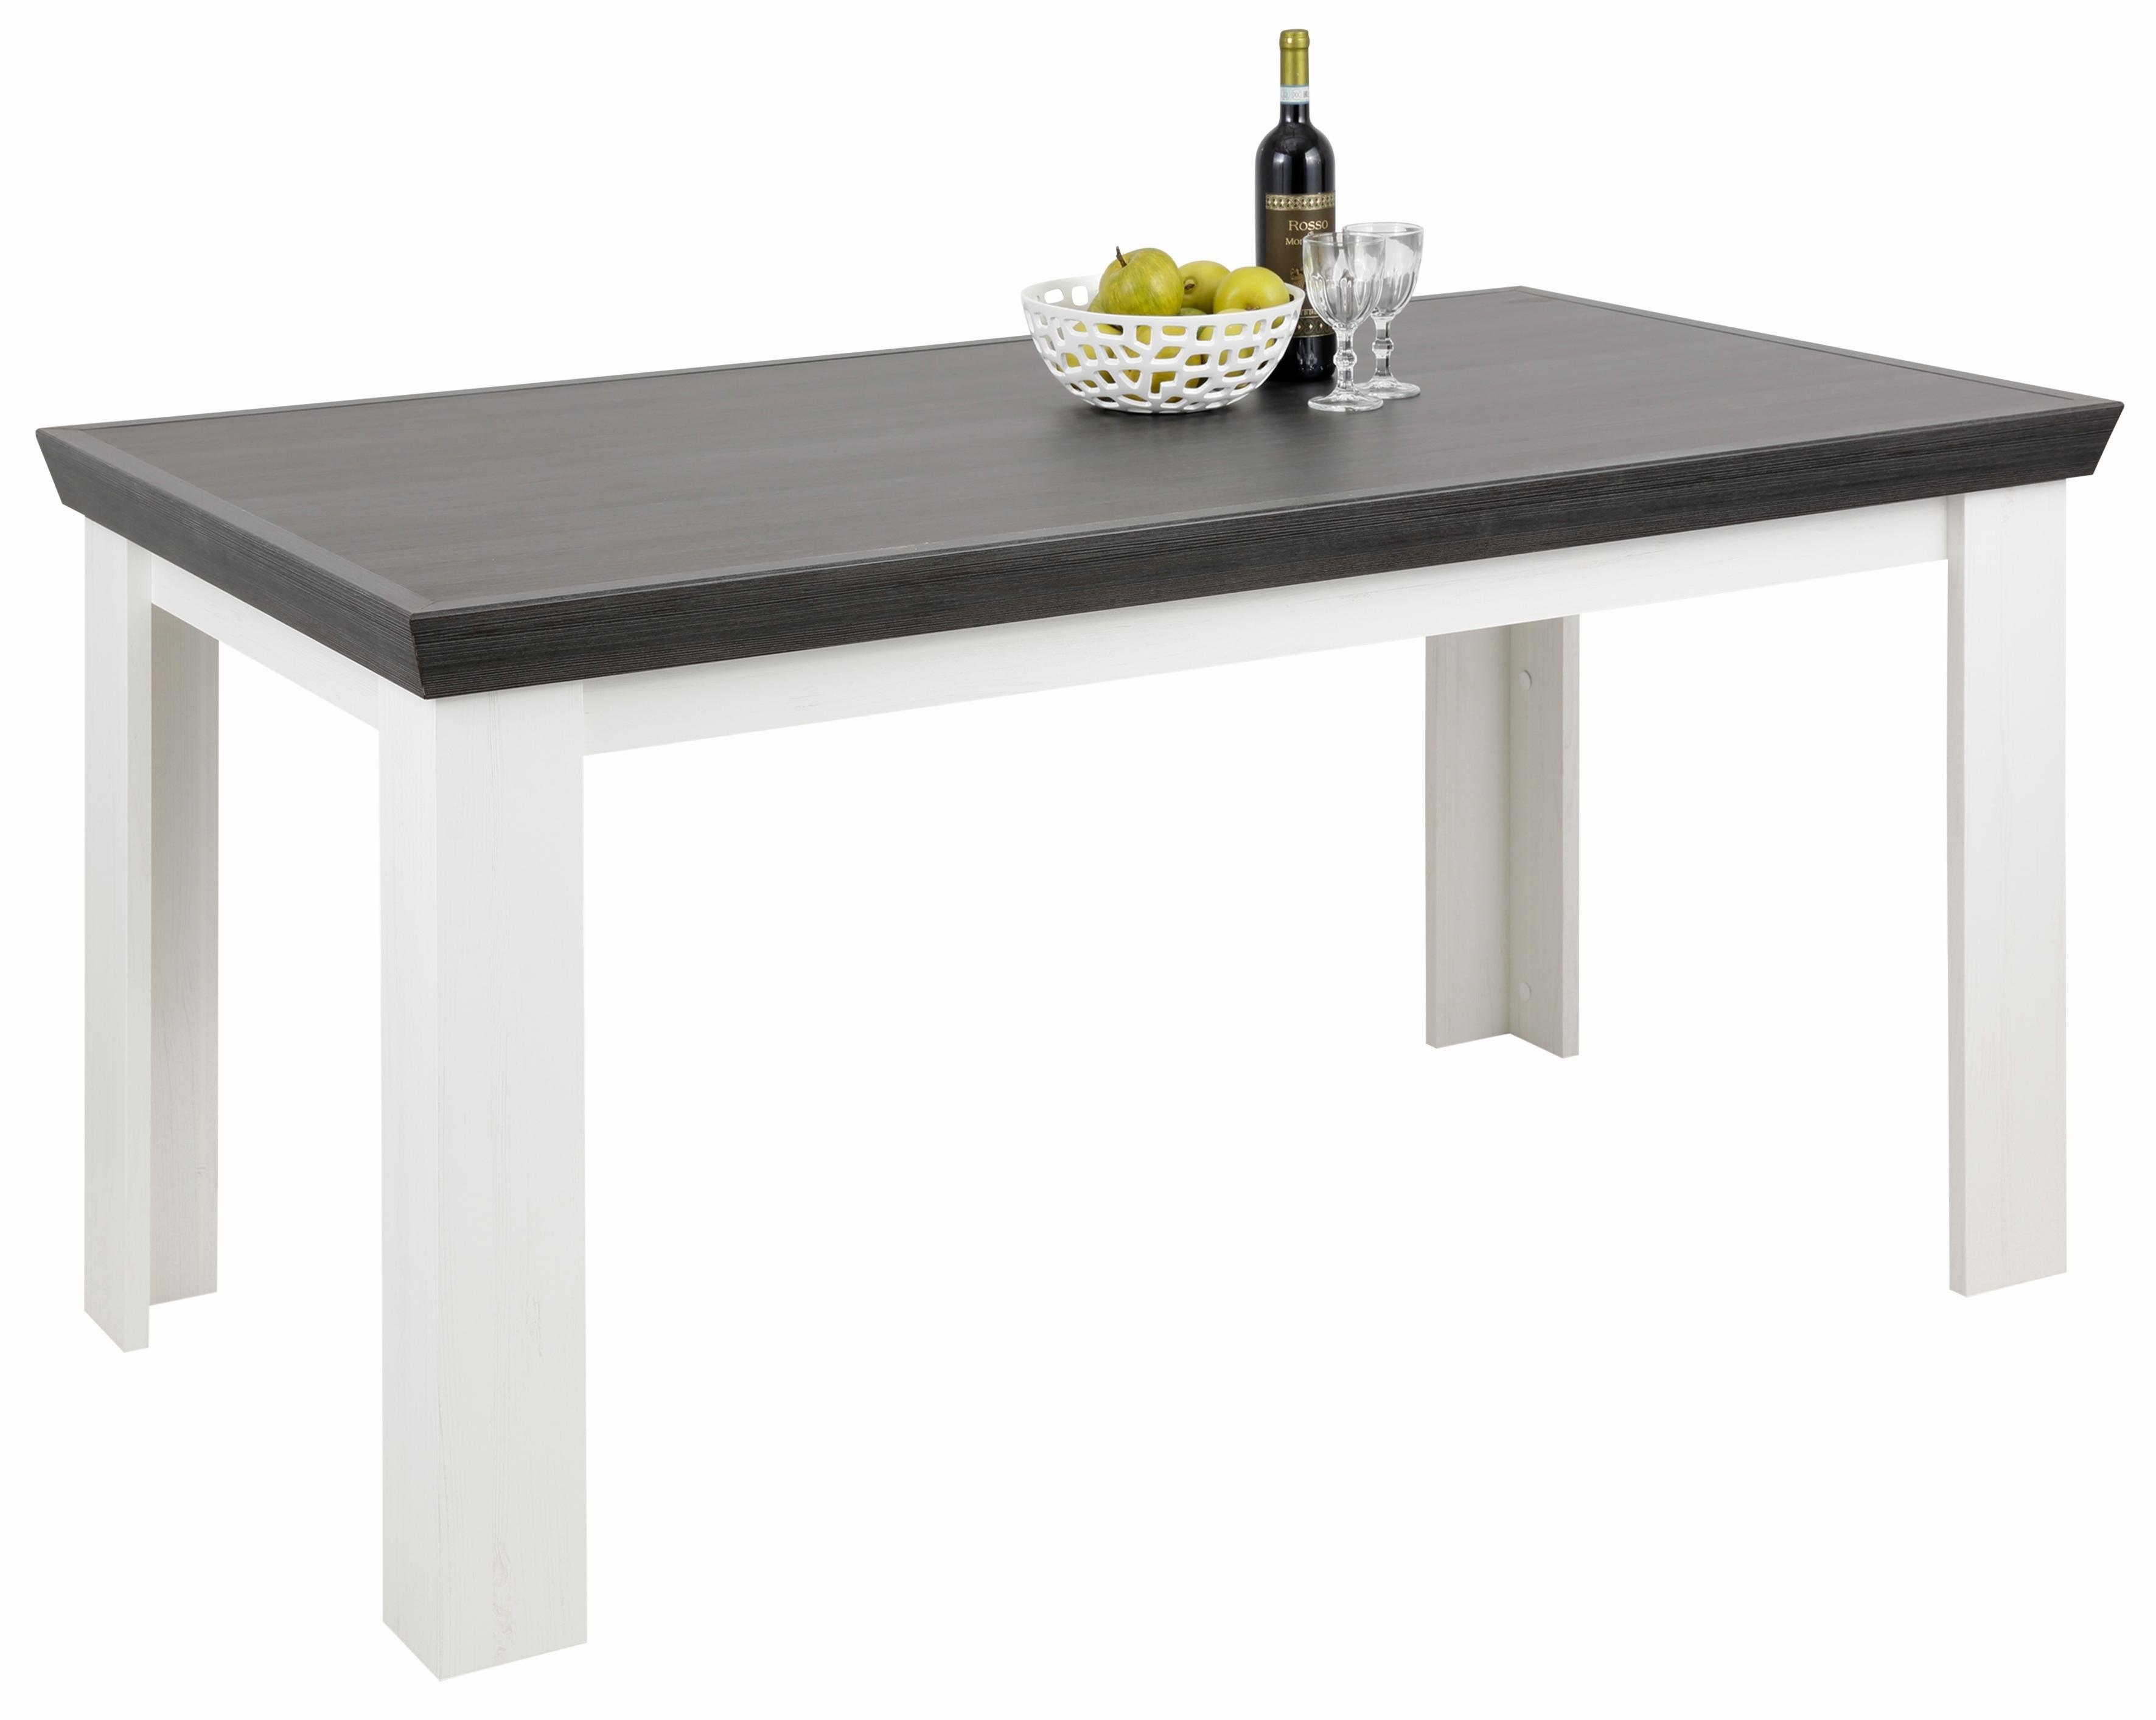 home affaire eettafel siena breedte 160 cm online kopen otto. Black Bedroom Furniture Sets. Home Design Ideas